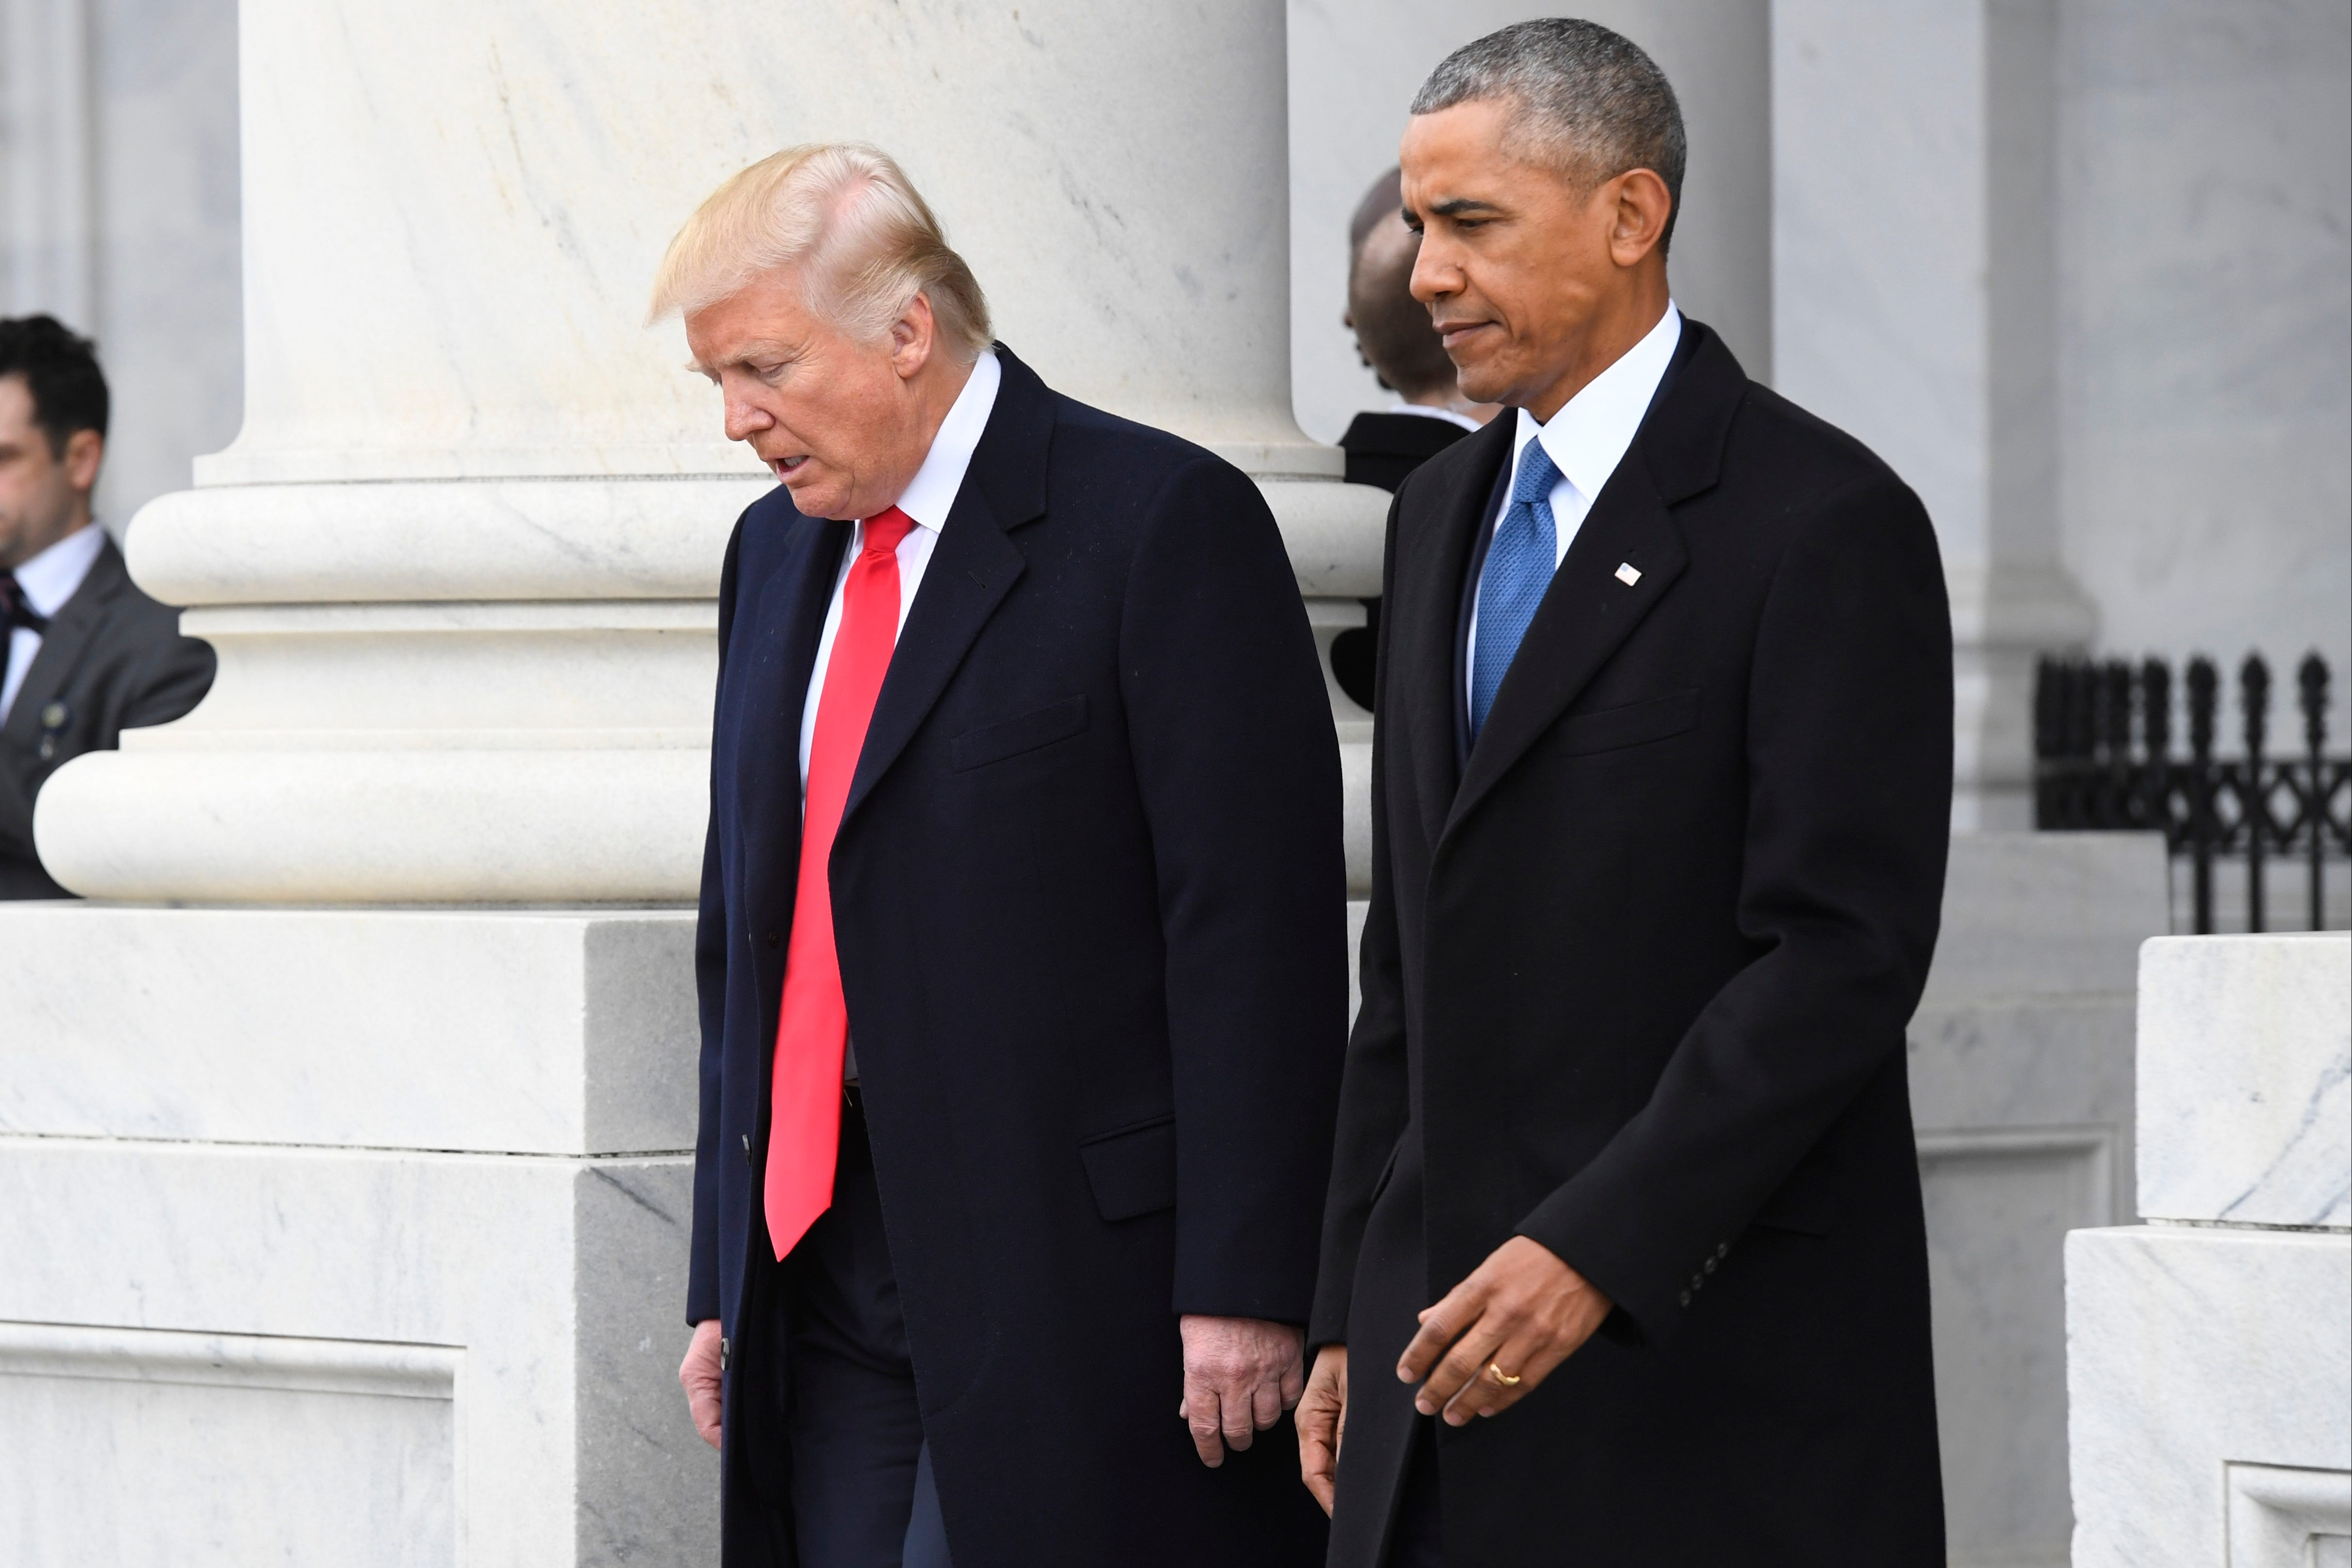 Impeachment whine: Trump thinks Republicans weren't tough on Obama. Believe me, we were.